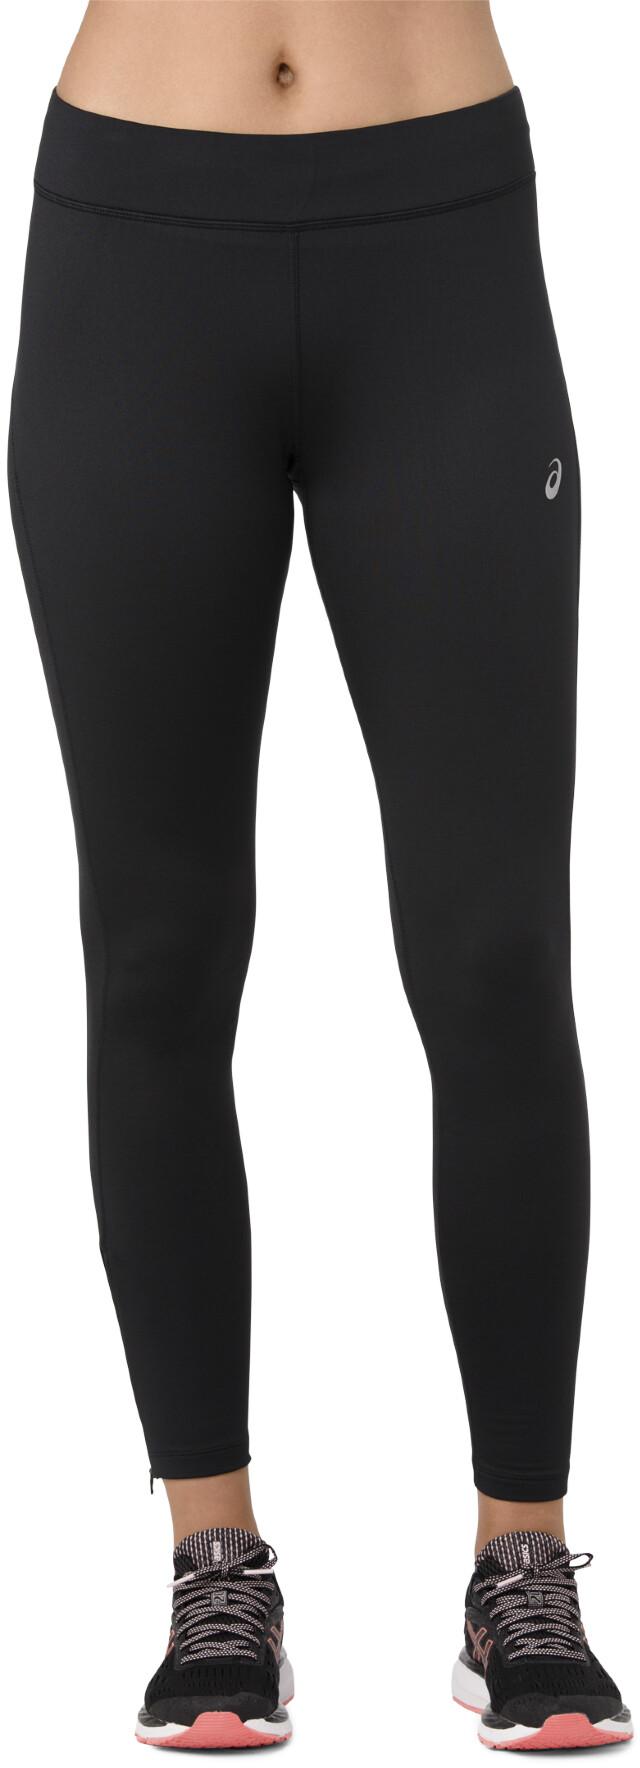 bbc7ca810a73 asics Silver Running Pants Women black at Addnature.co.uk